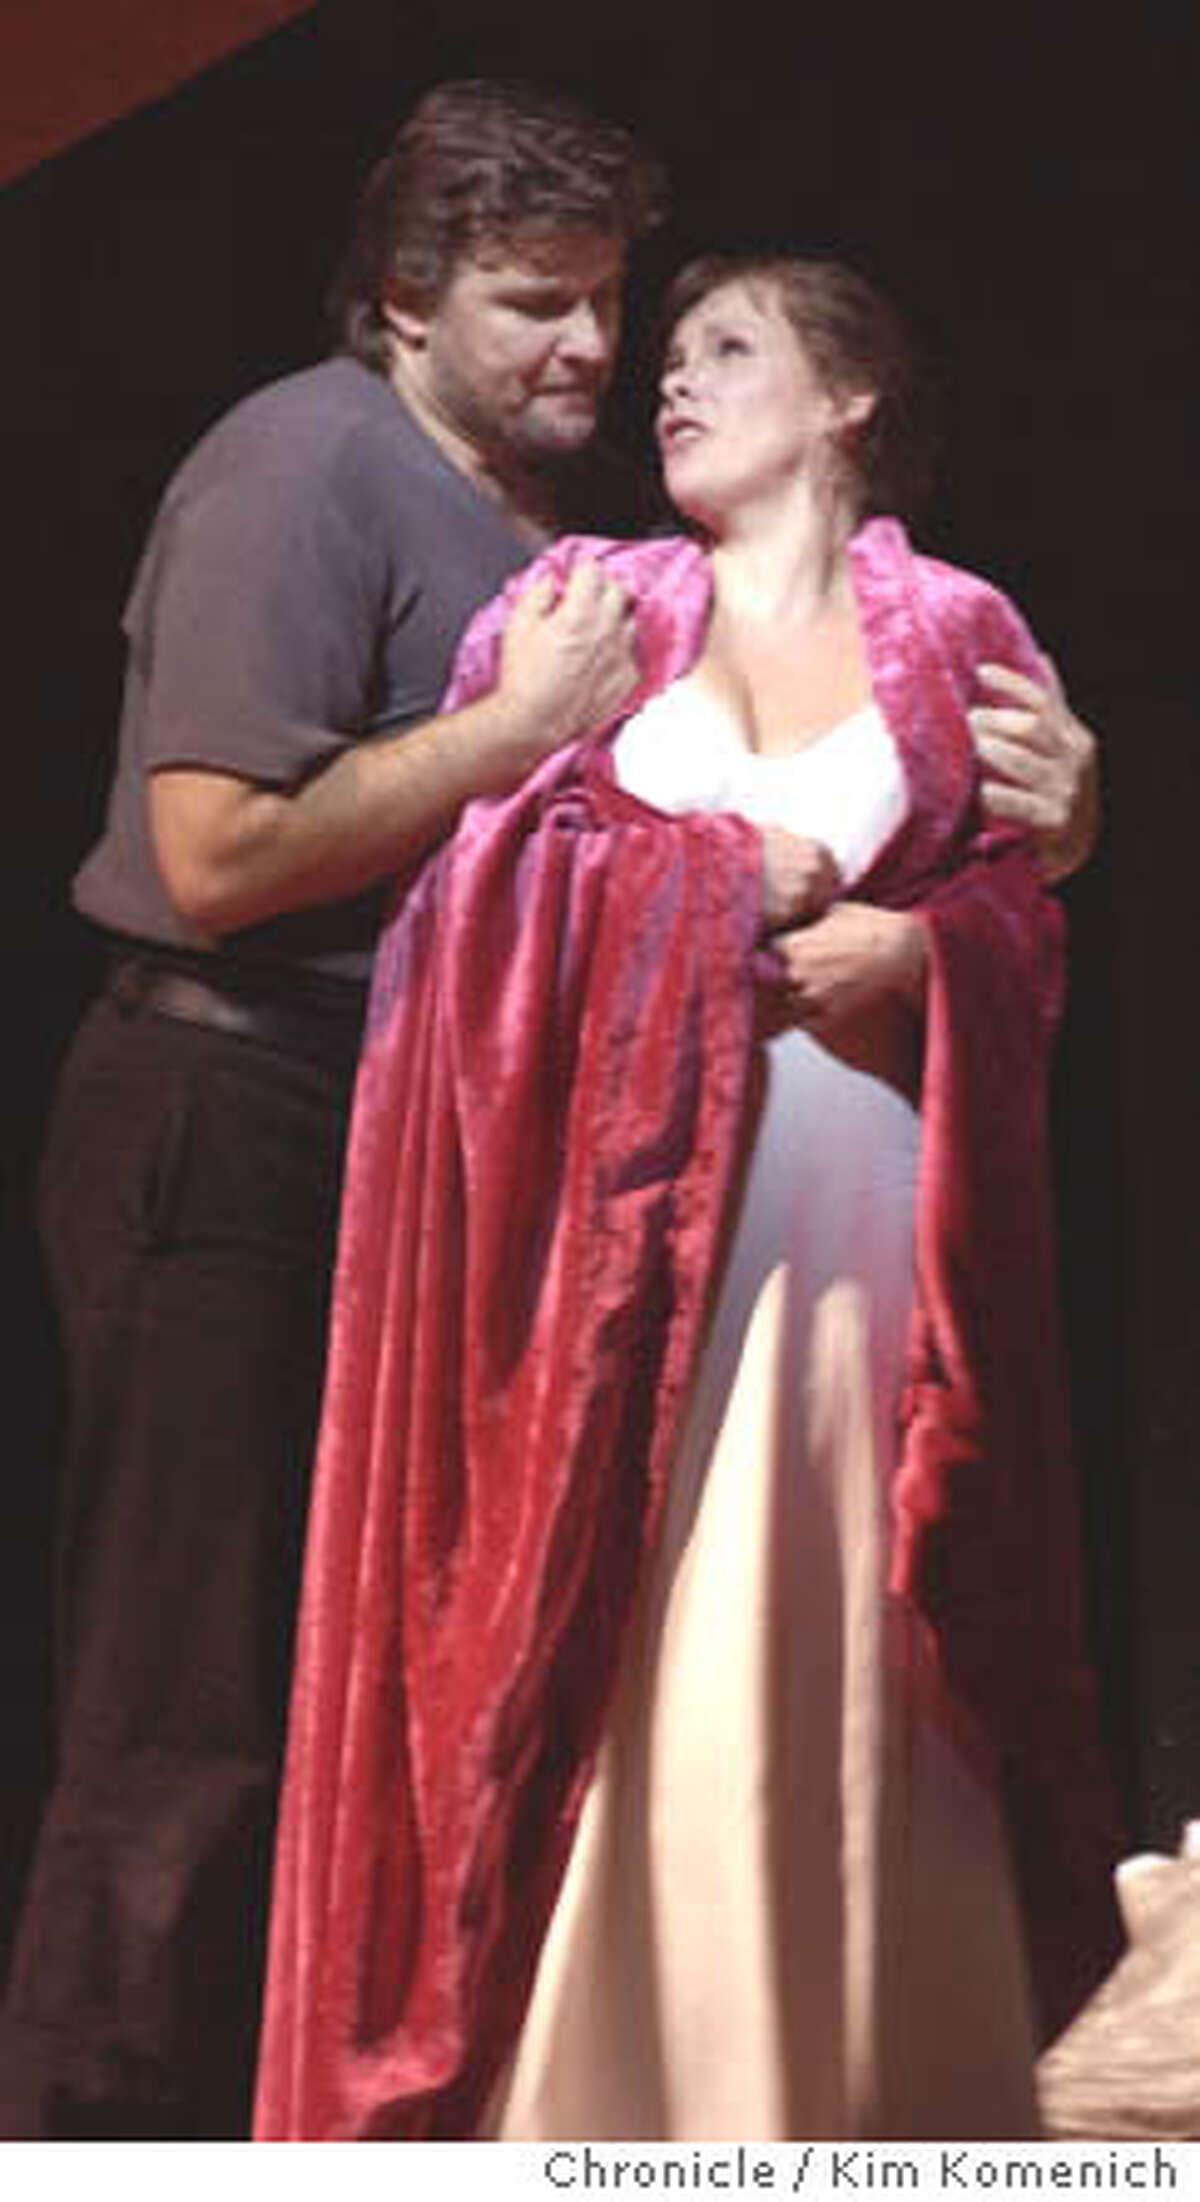 11/6/03 in San Francisco. San Francisco Opera presents Lady Macbeth of Mtsensk. Sergei (Christopher Ventris) gets friendly with Katerina (Solveig Kringelborn), KIM KOMENICH / The Chronicle